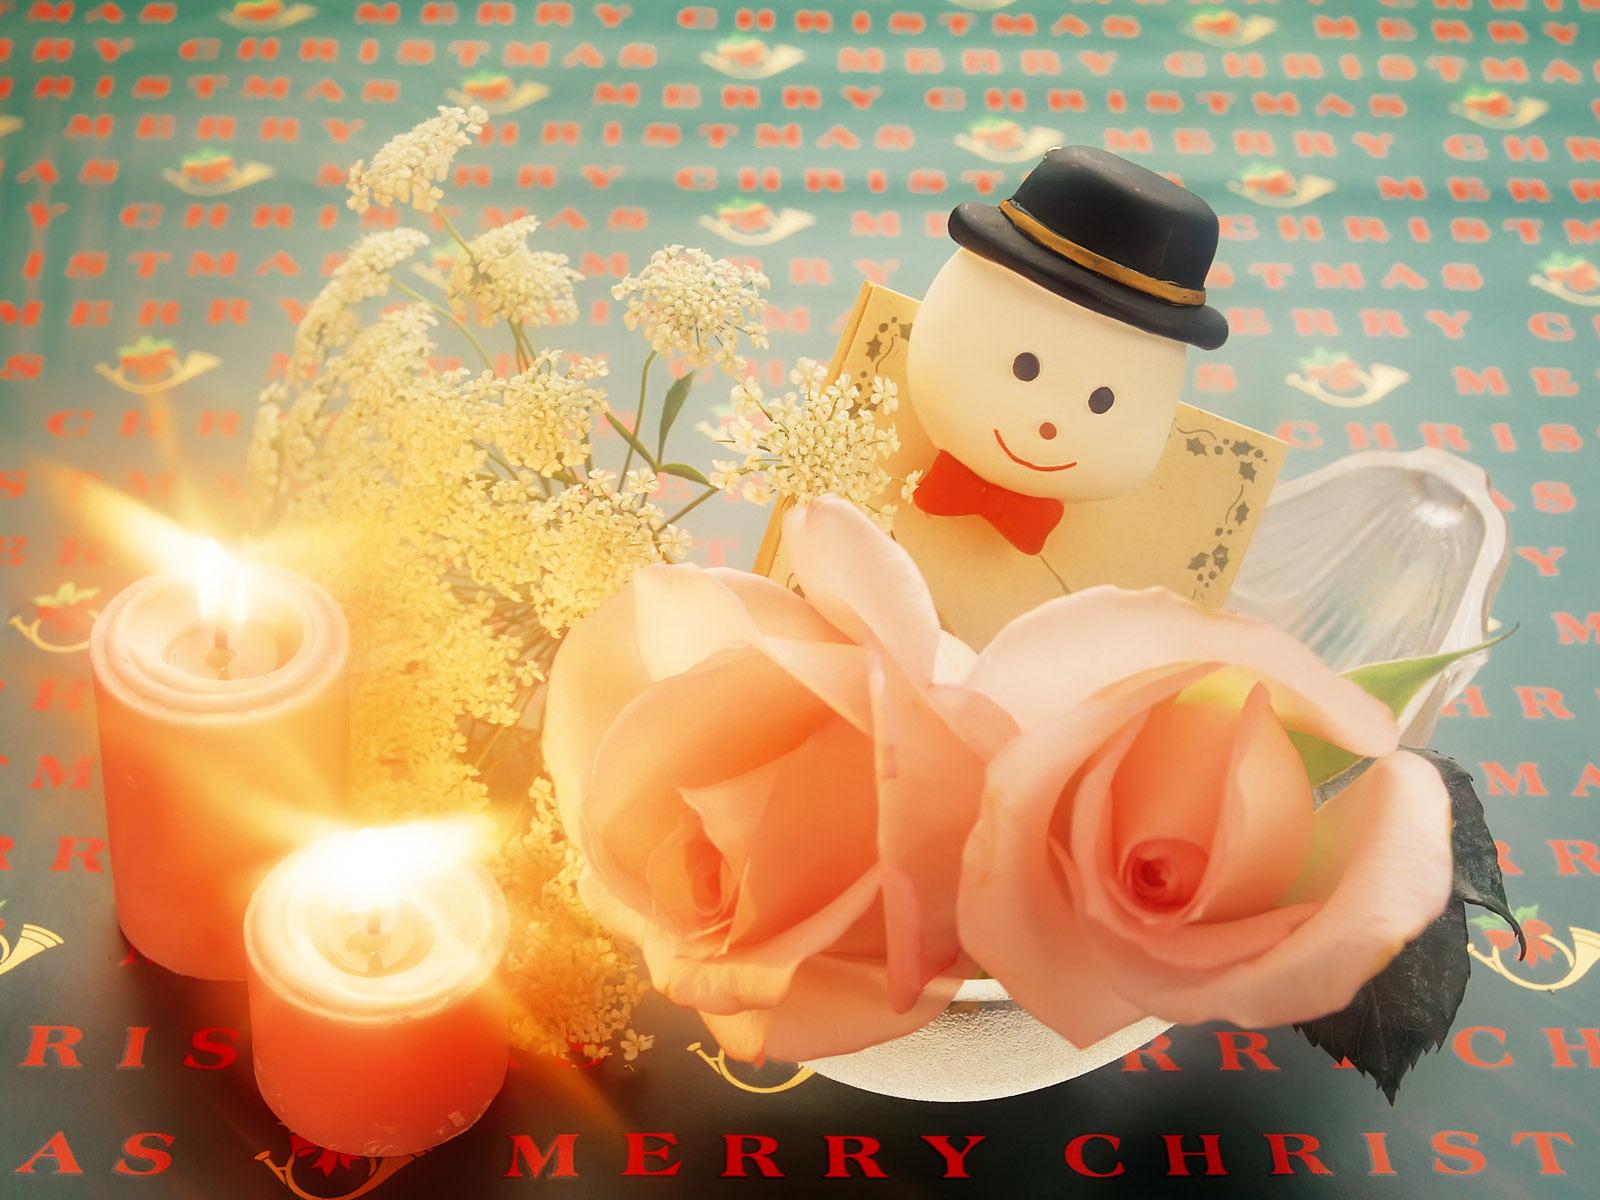 Sfondi Natale - Sfondi Addobbi Natalizi